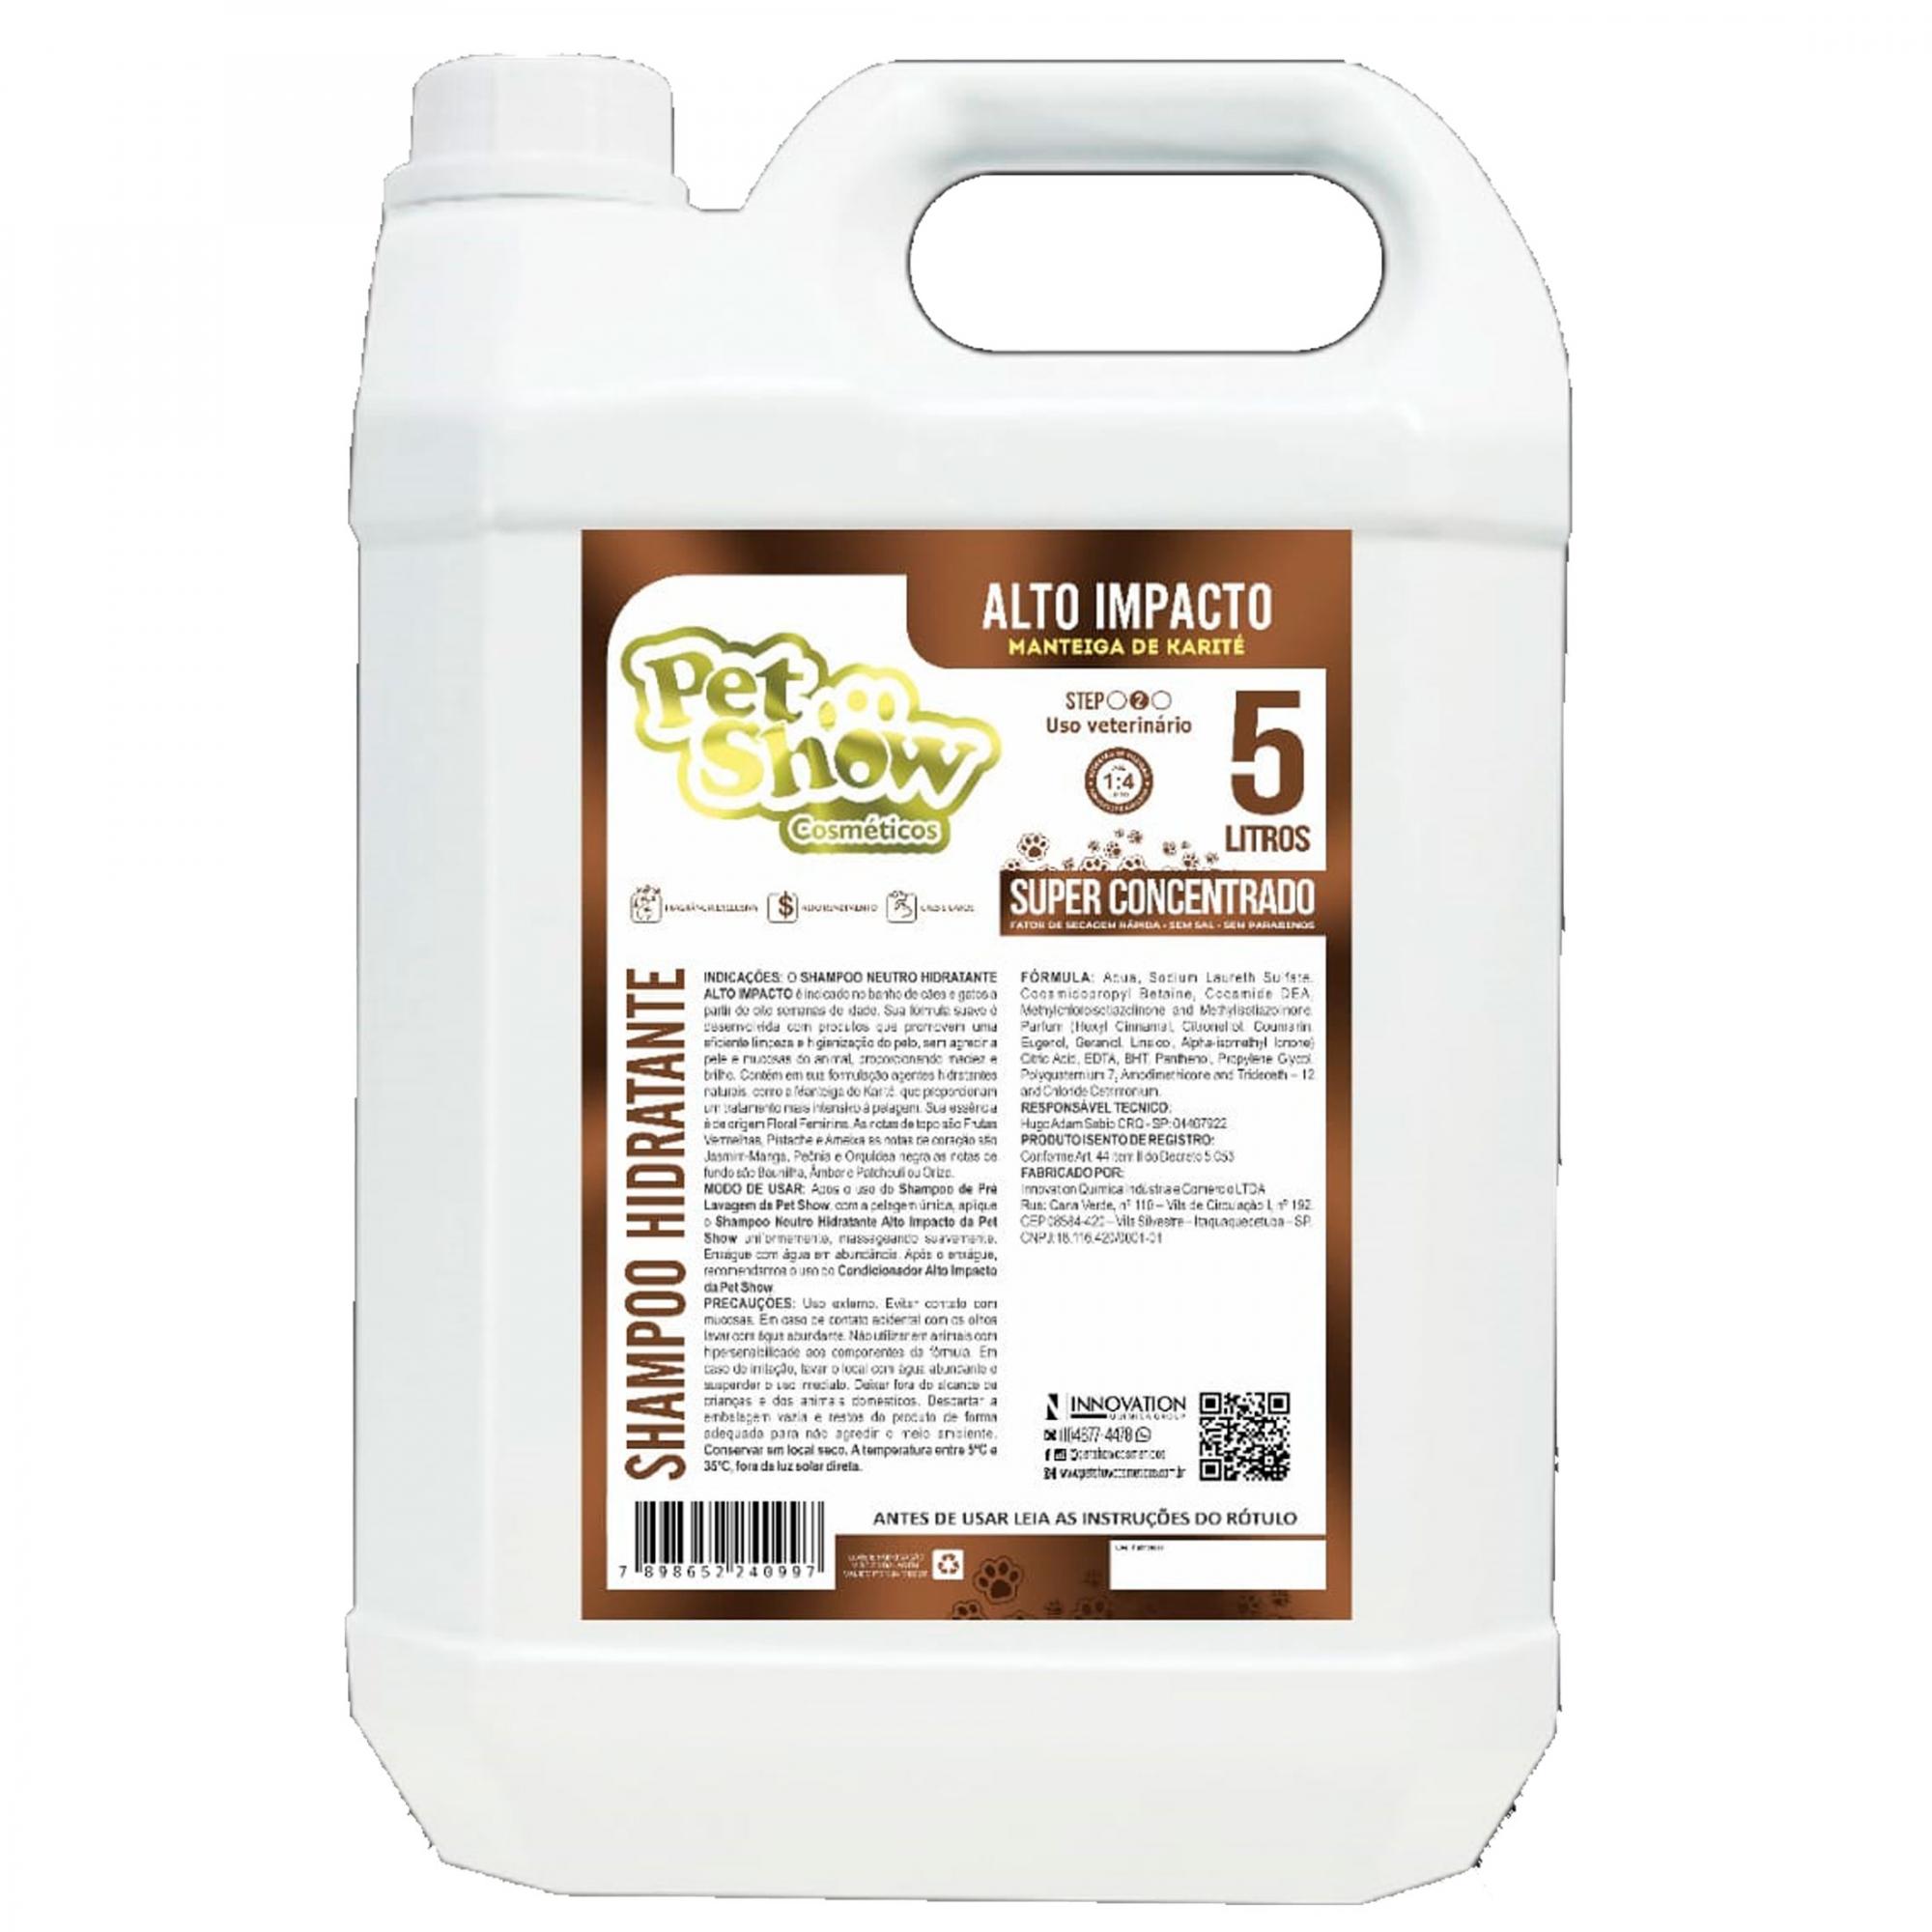 Shampoo Neutro Hidratante Alto Impacto 5L Pet Show